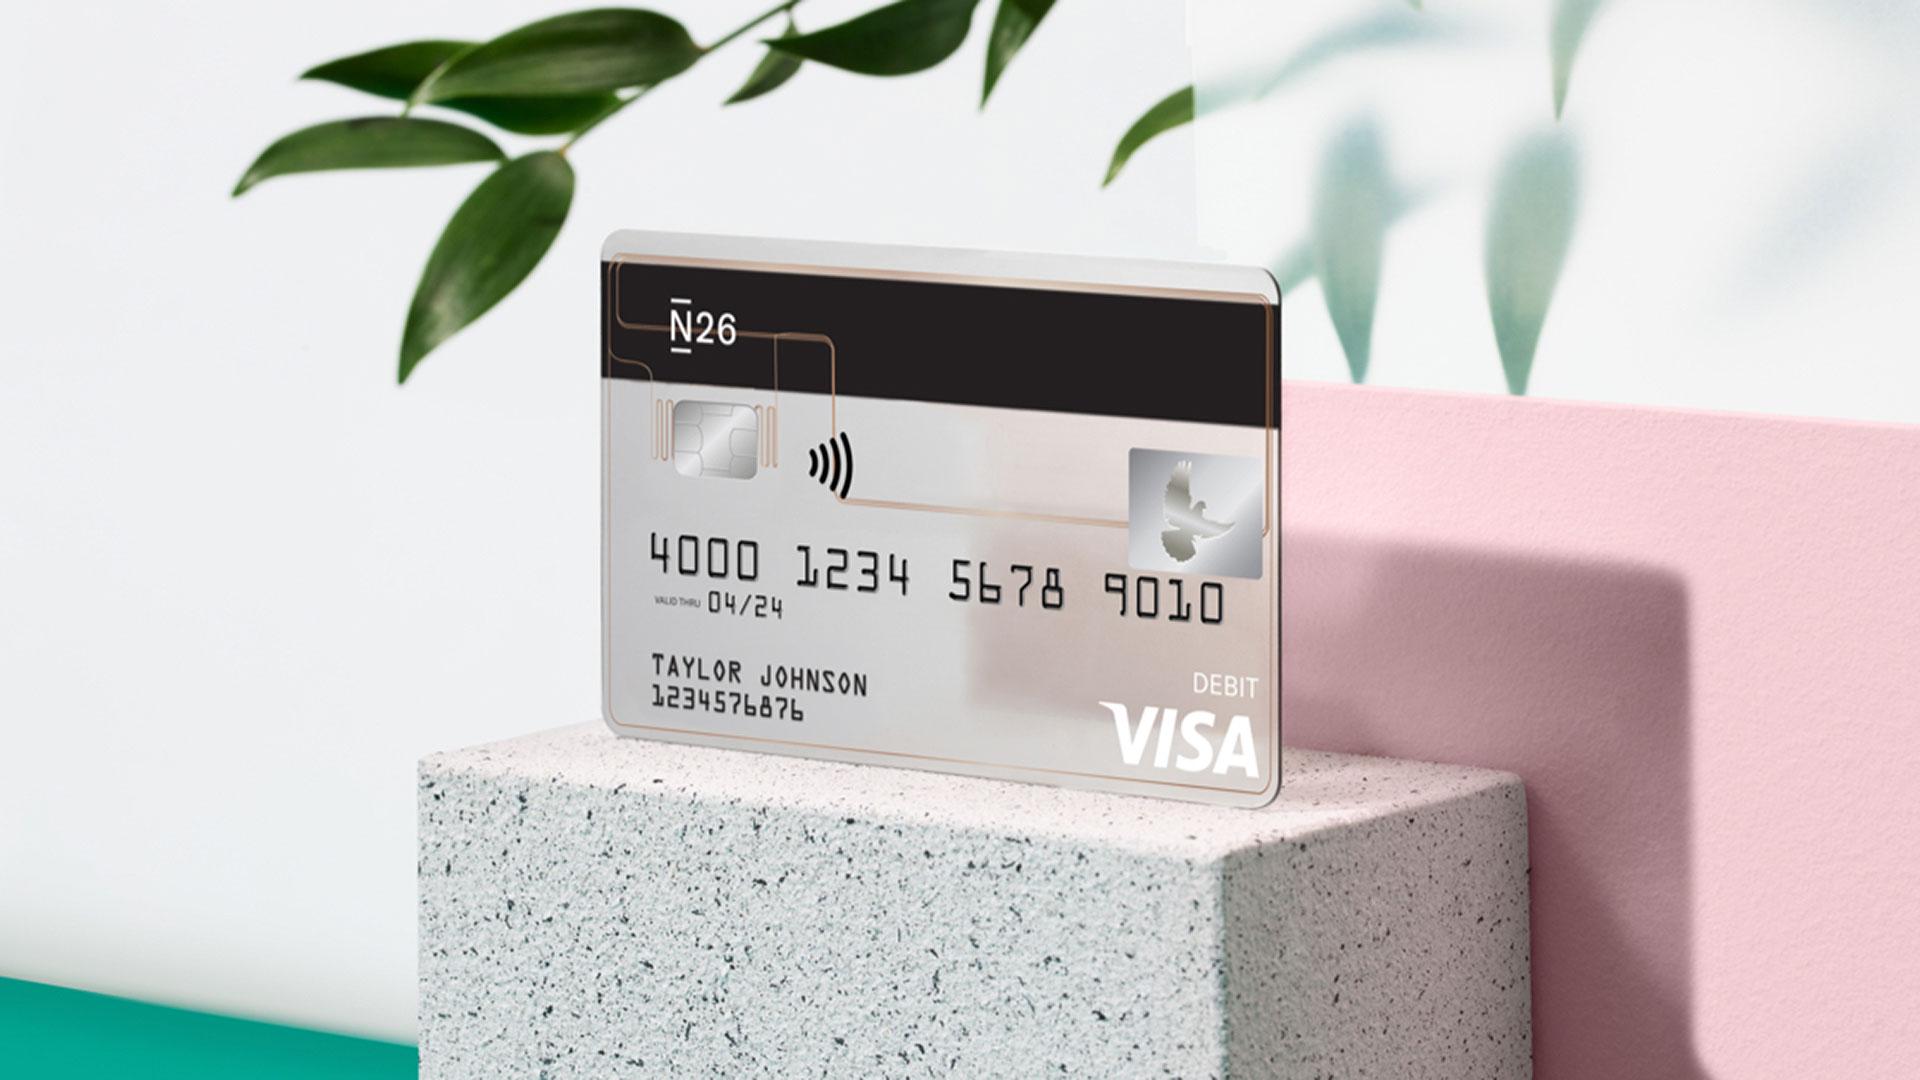 N10 10 Advantages of Using a Debit Card vs. Credit Card — N10